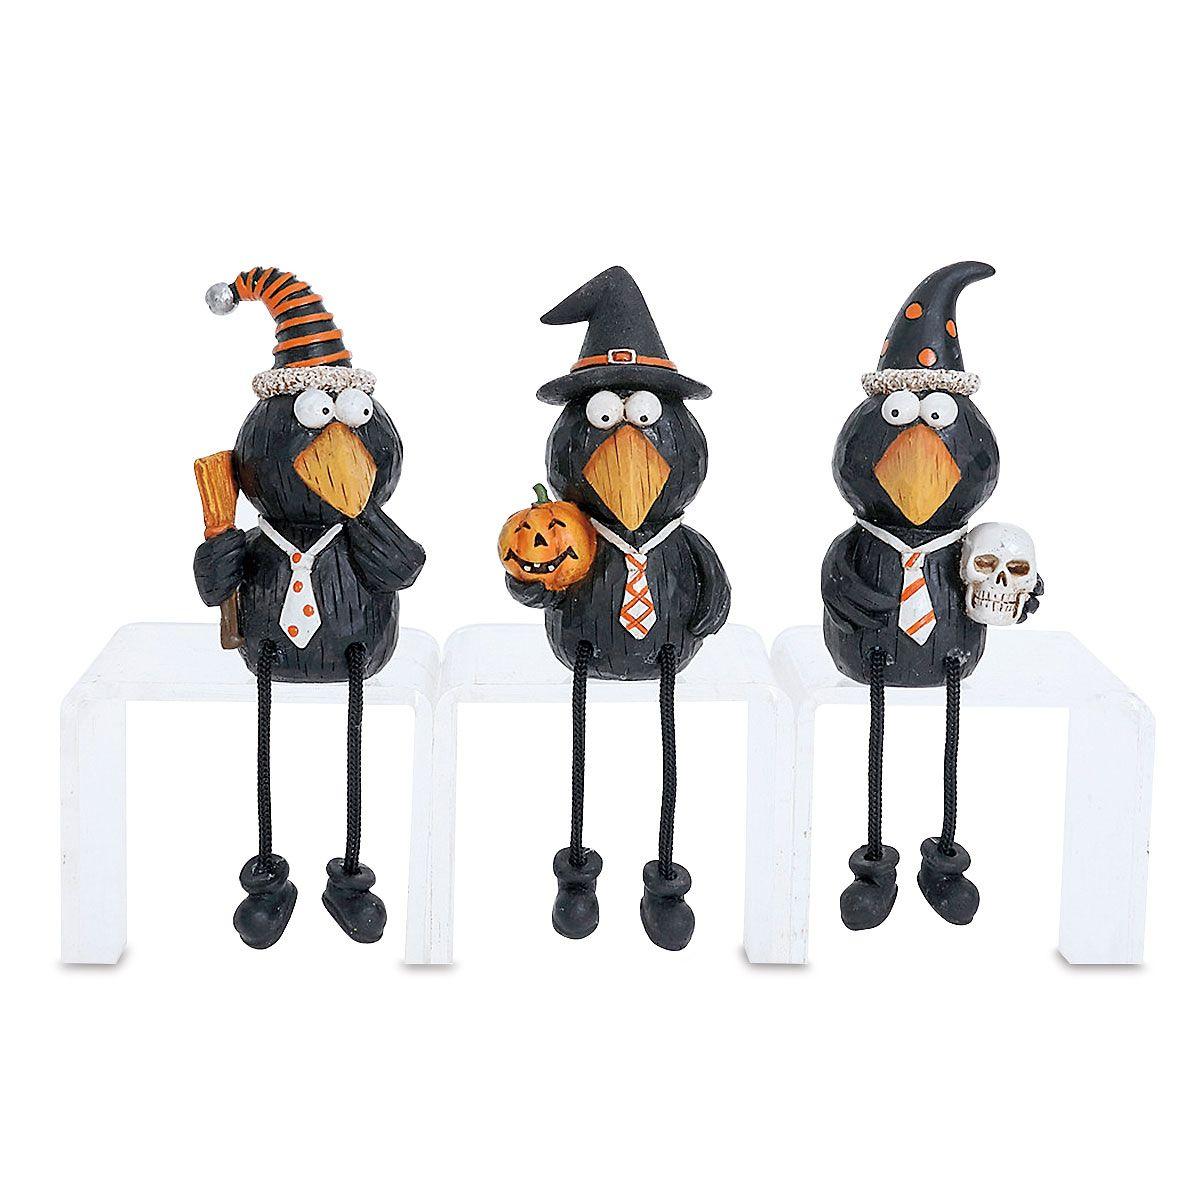 Black Crows Shelf-Sitter Figurines